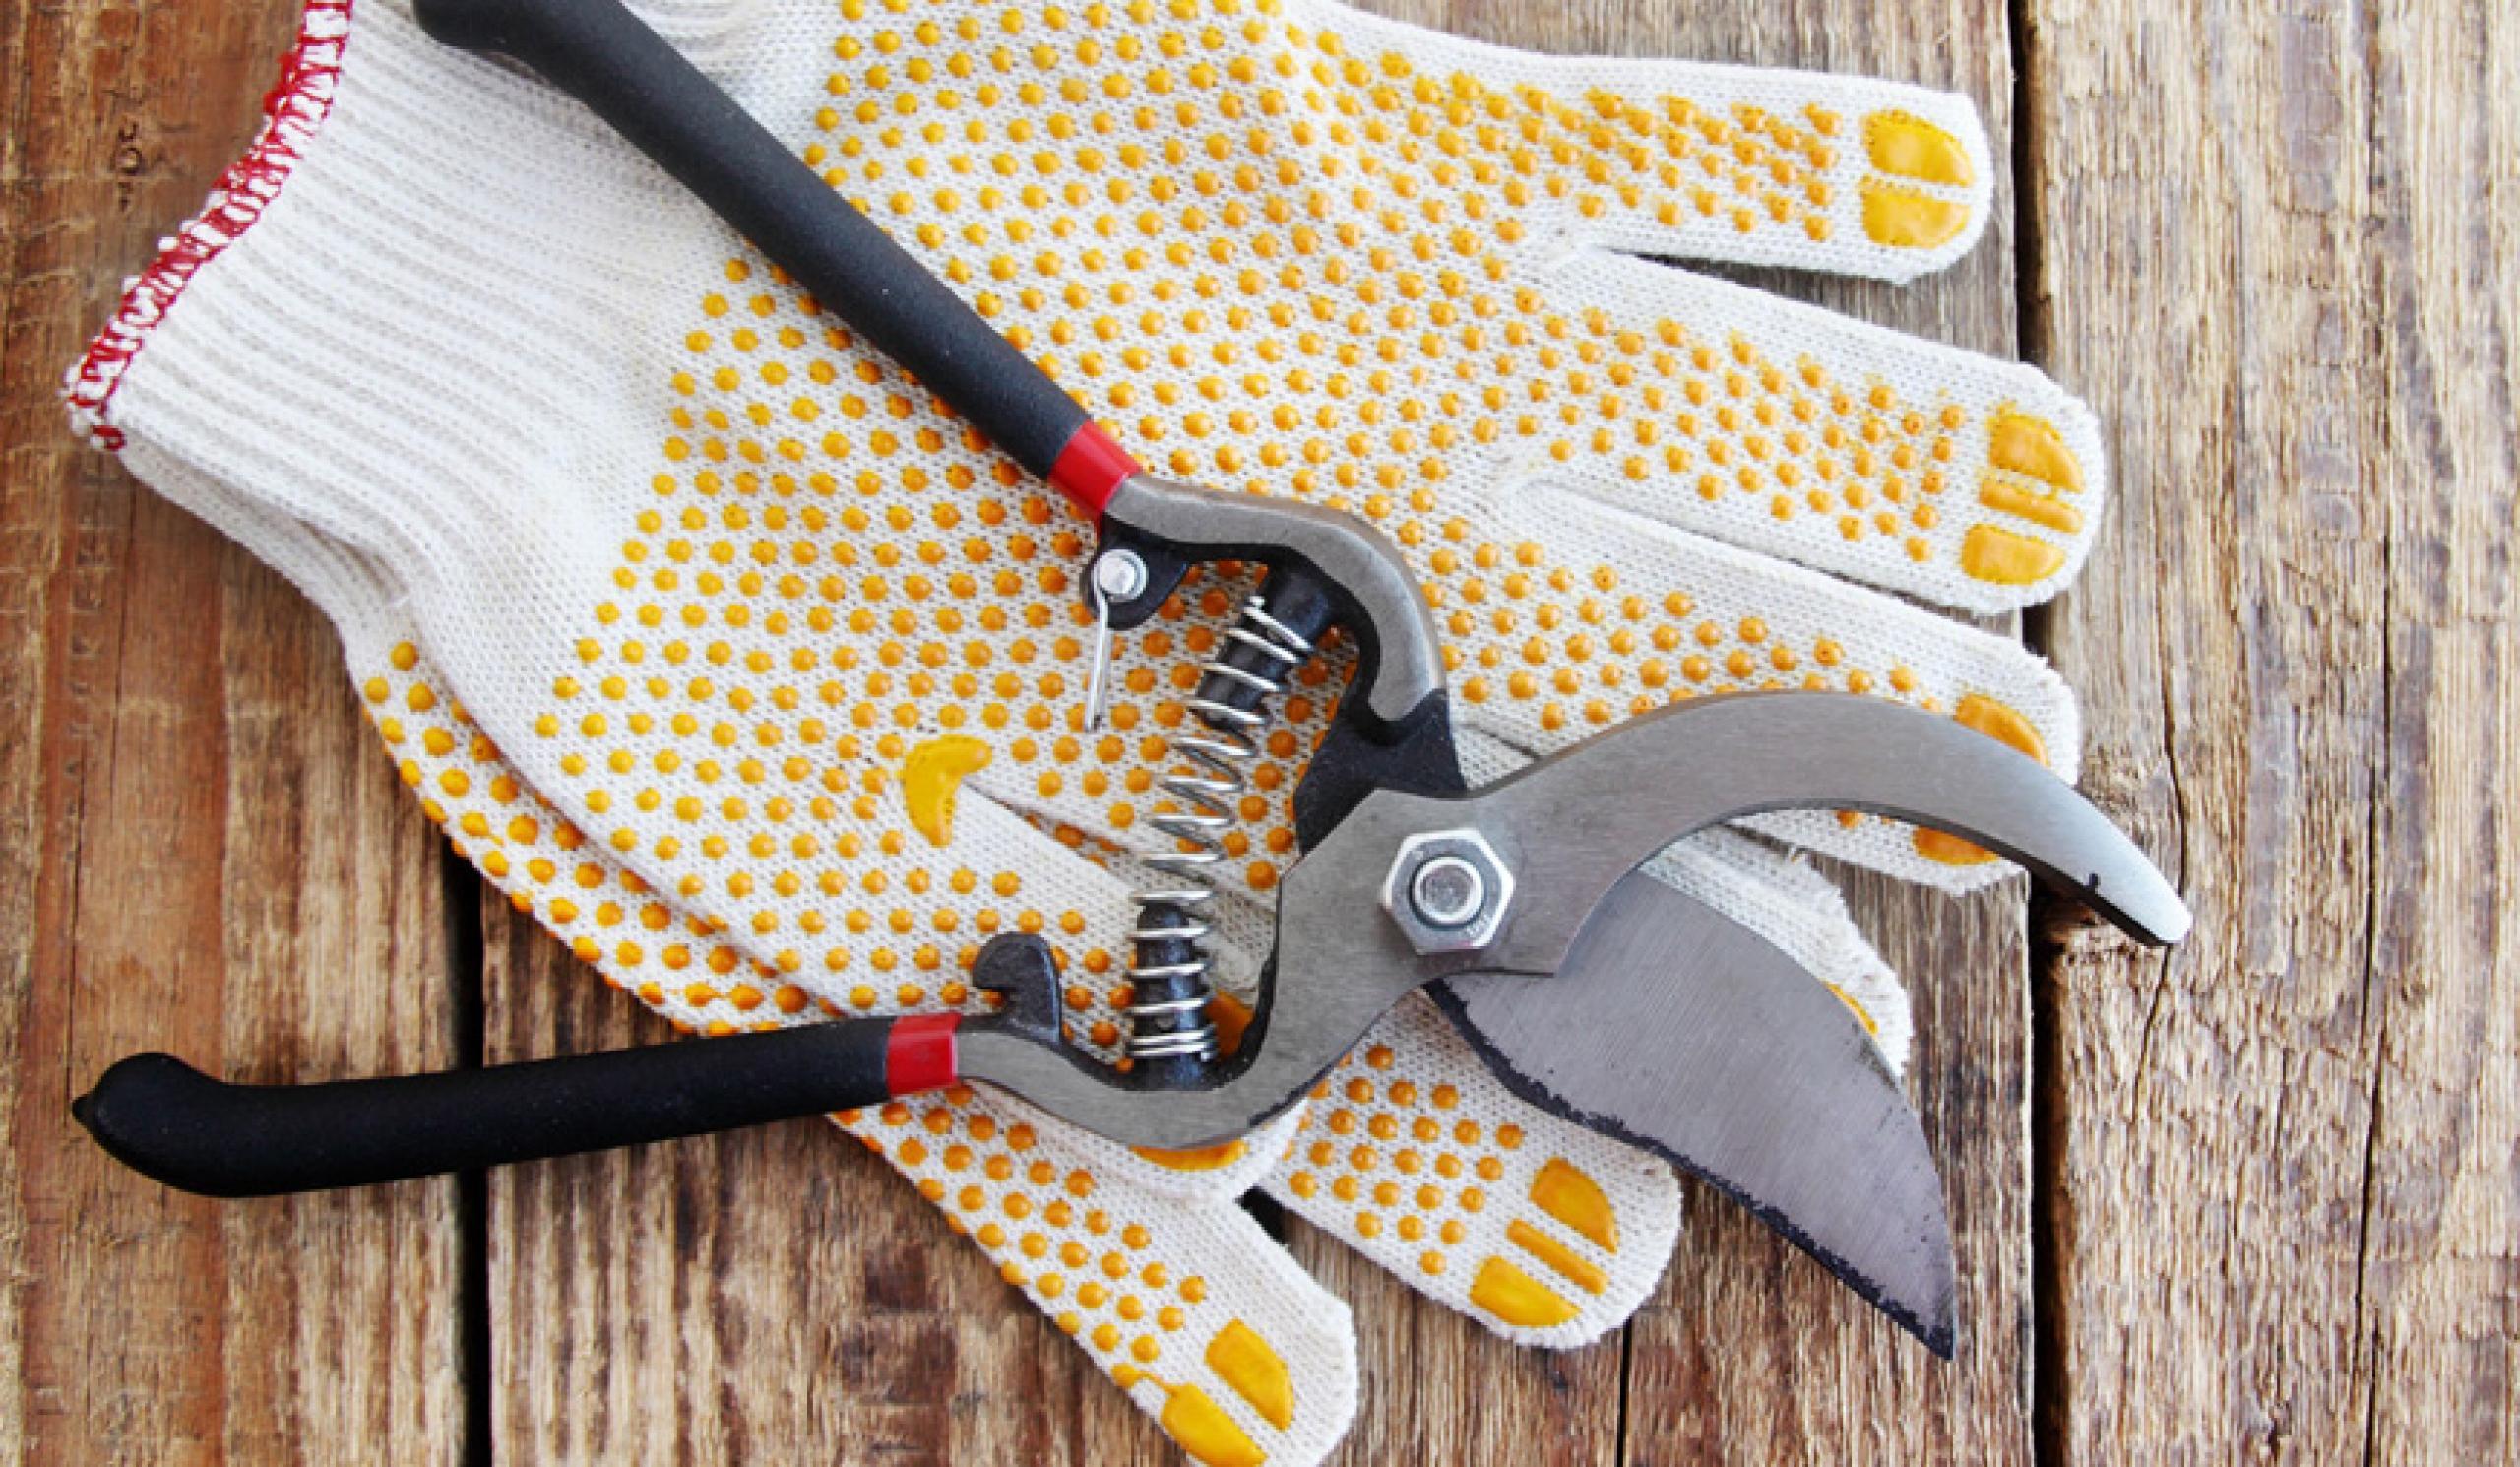 Garden maintenance and outdoor jobs